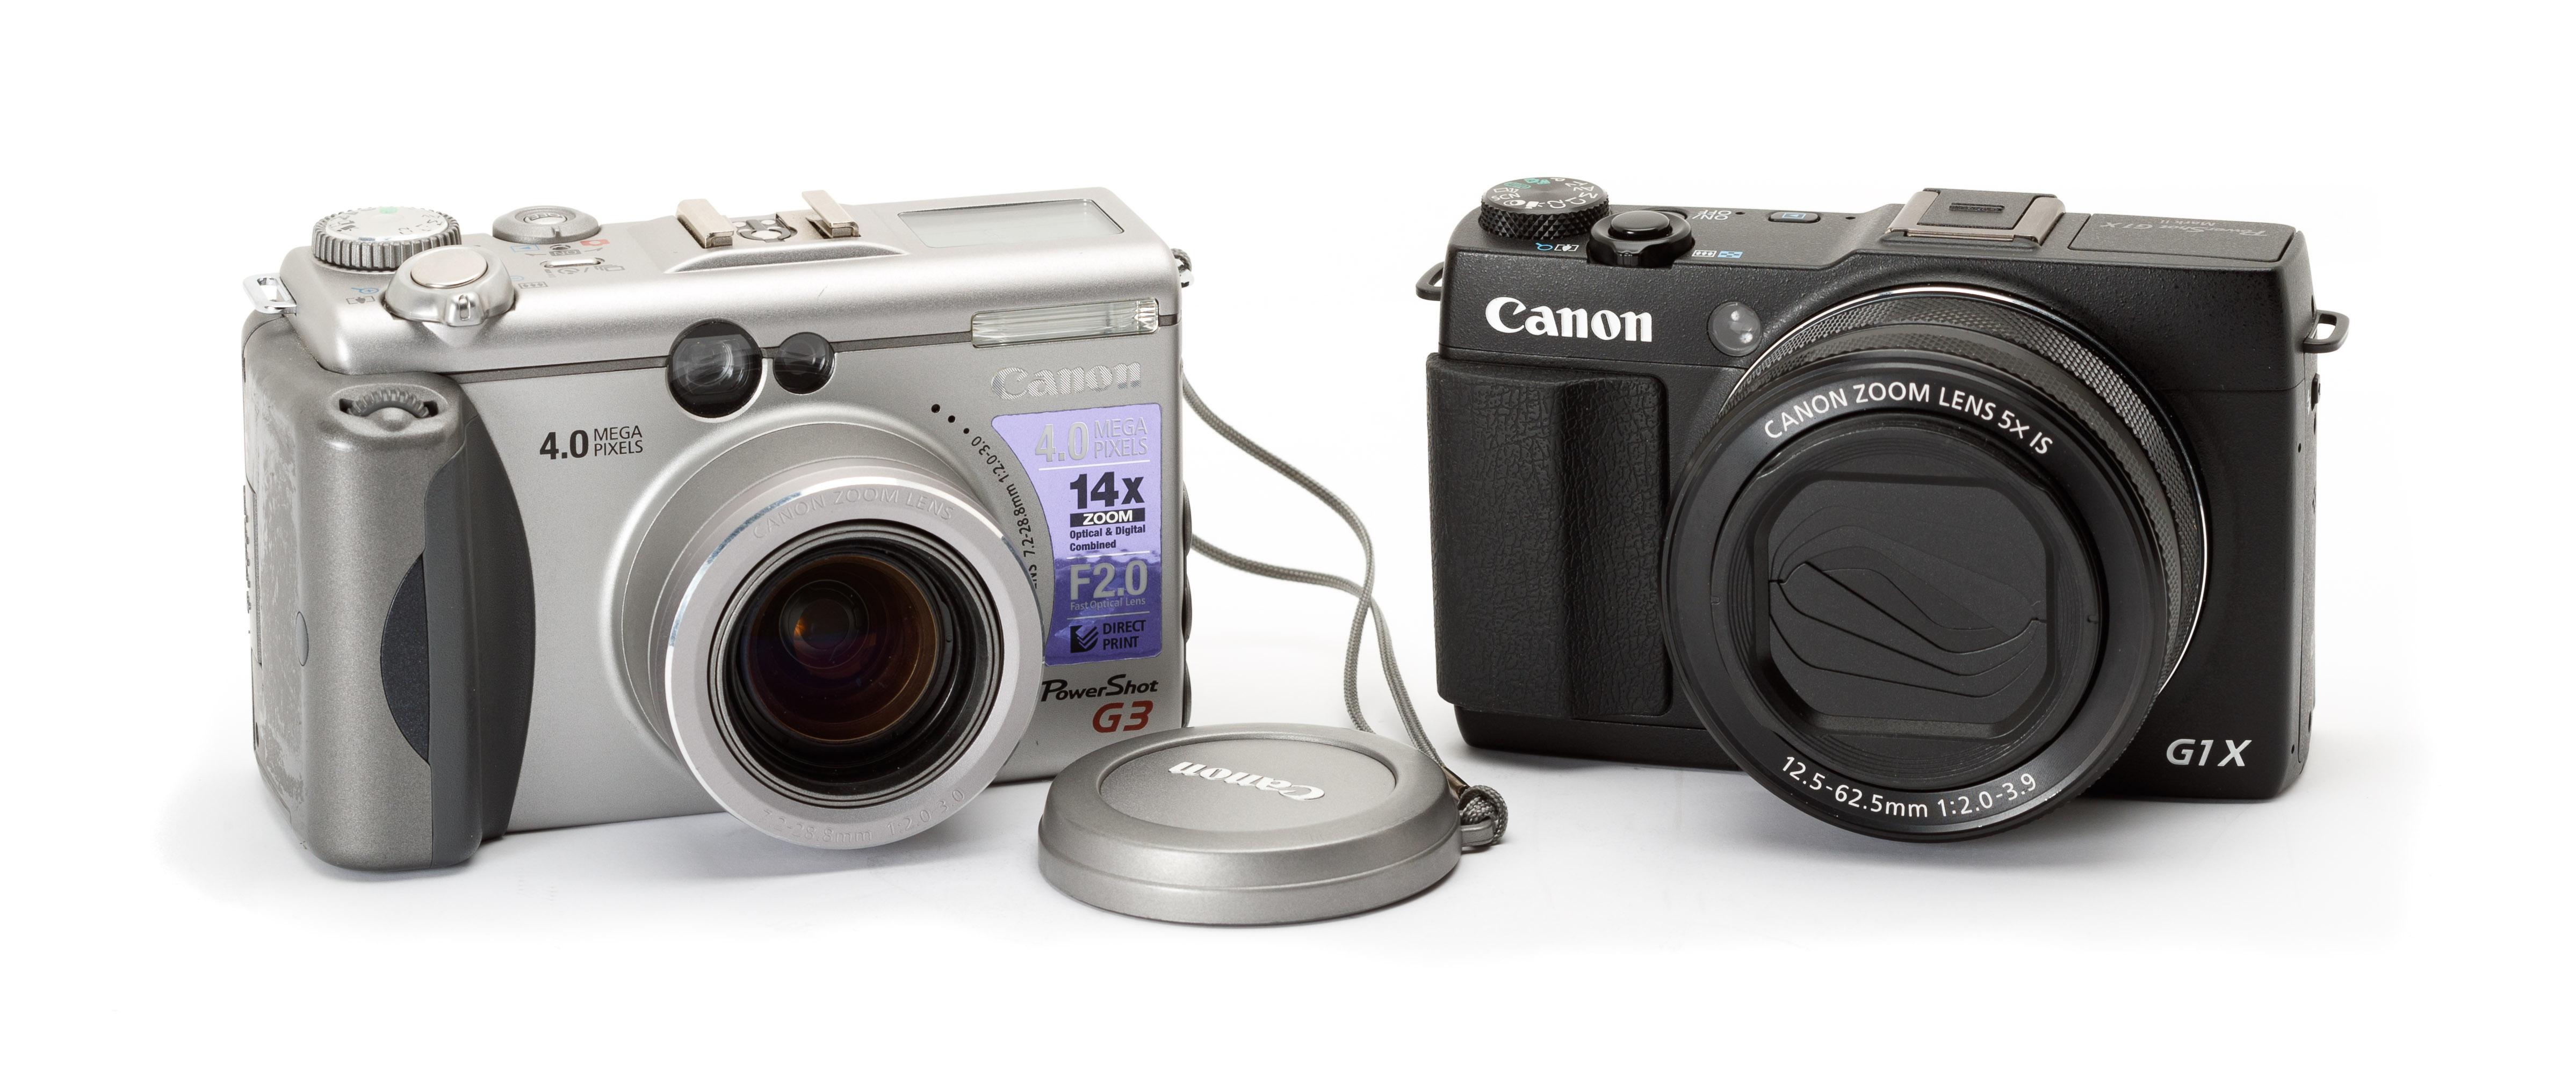 Canon powershot a650 is инструкция